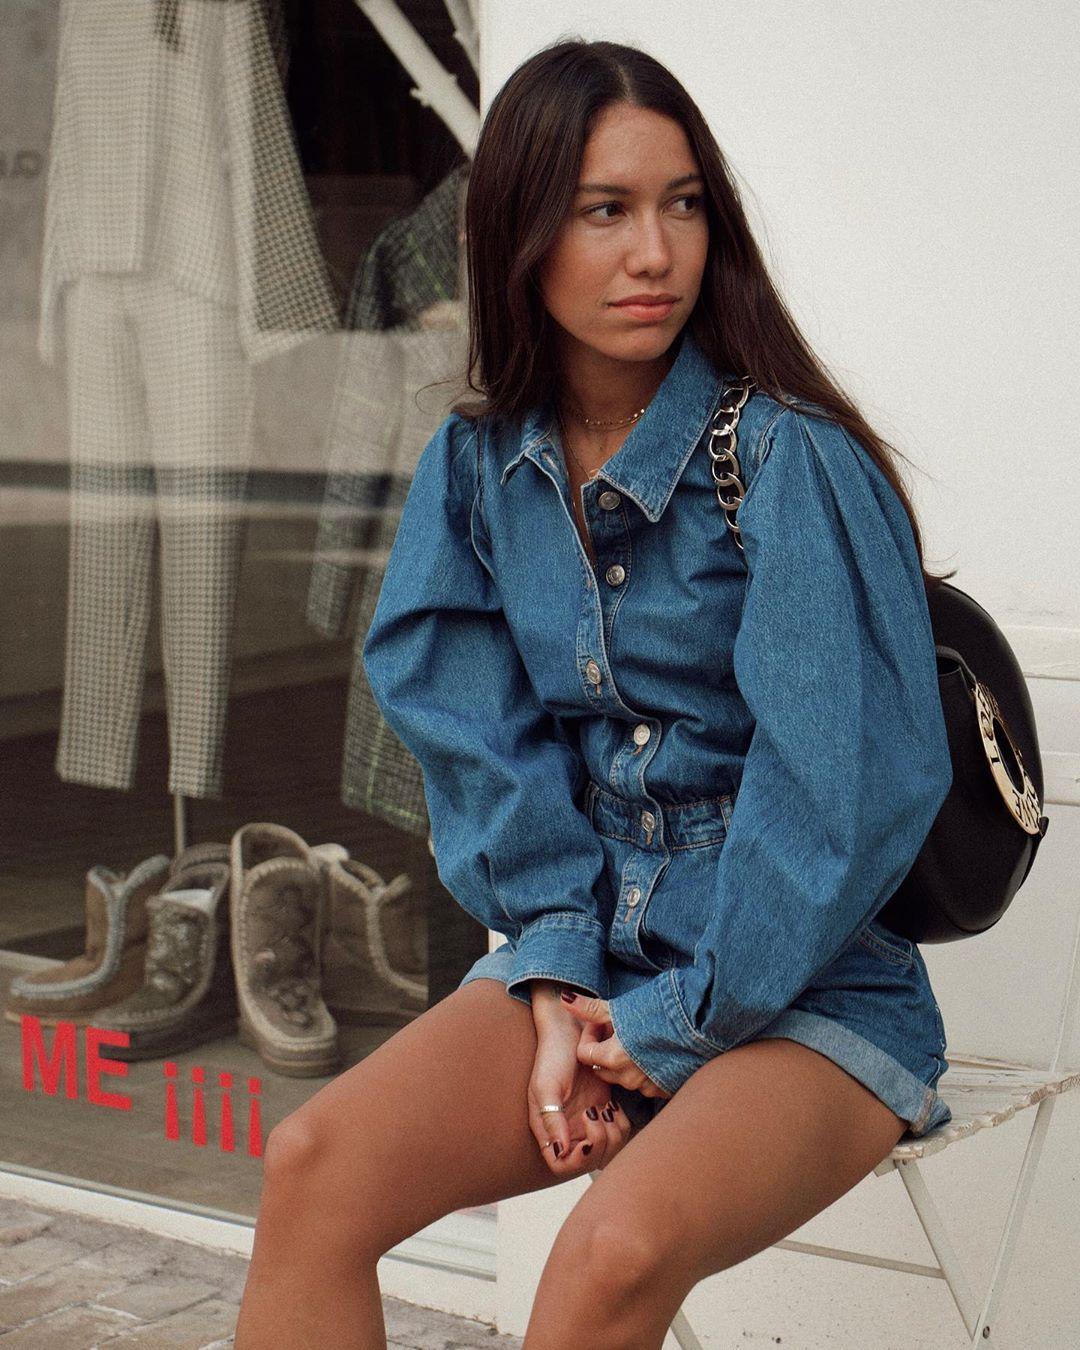 Melissa-Villarreal-Wallpapers-Insta-Fit-Bio-2